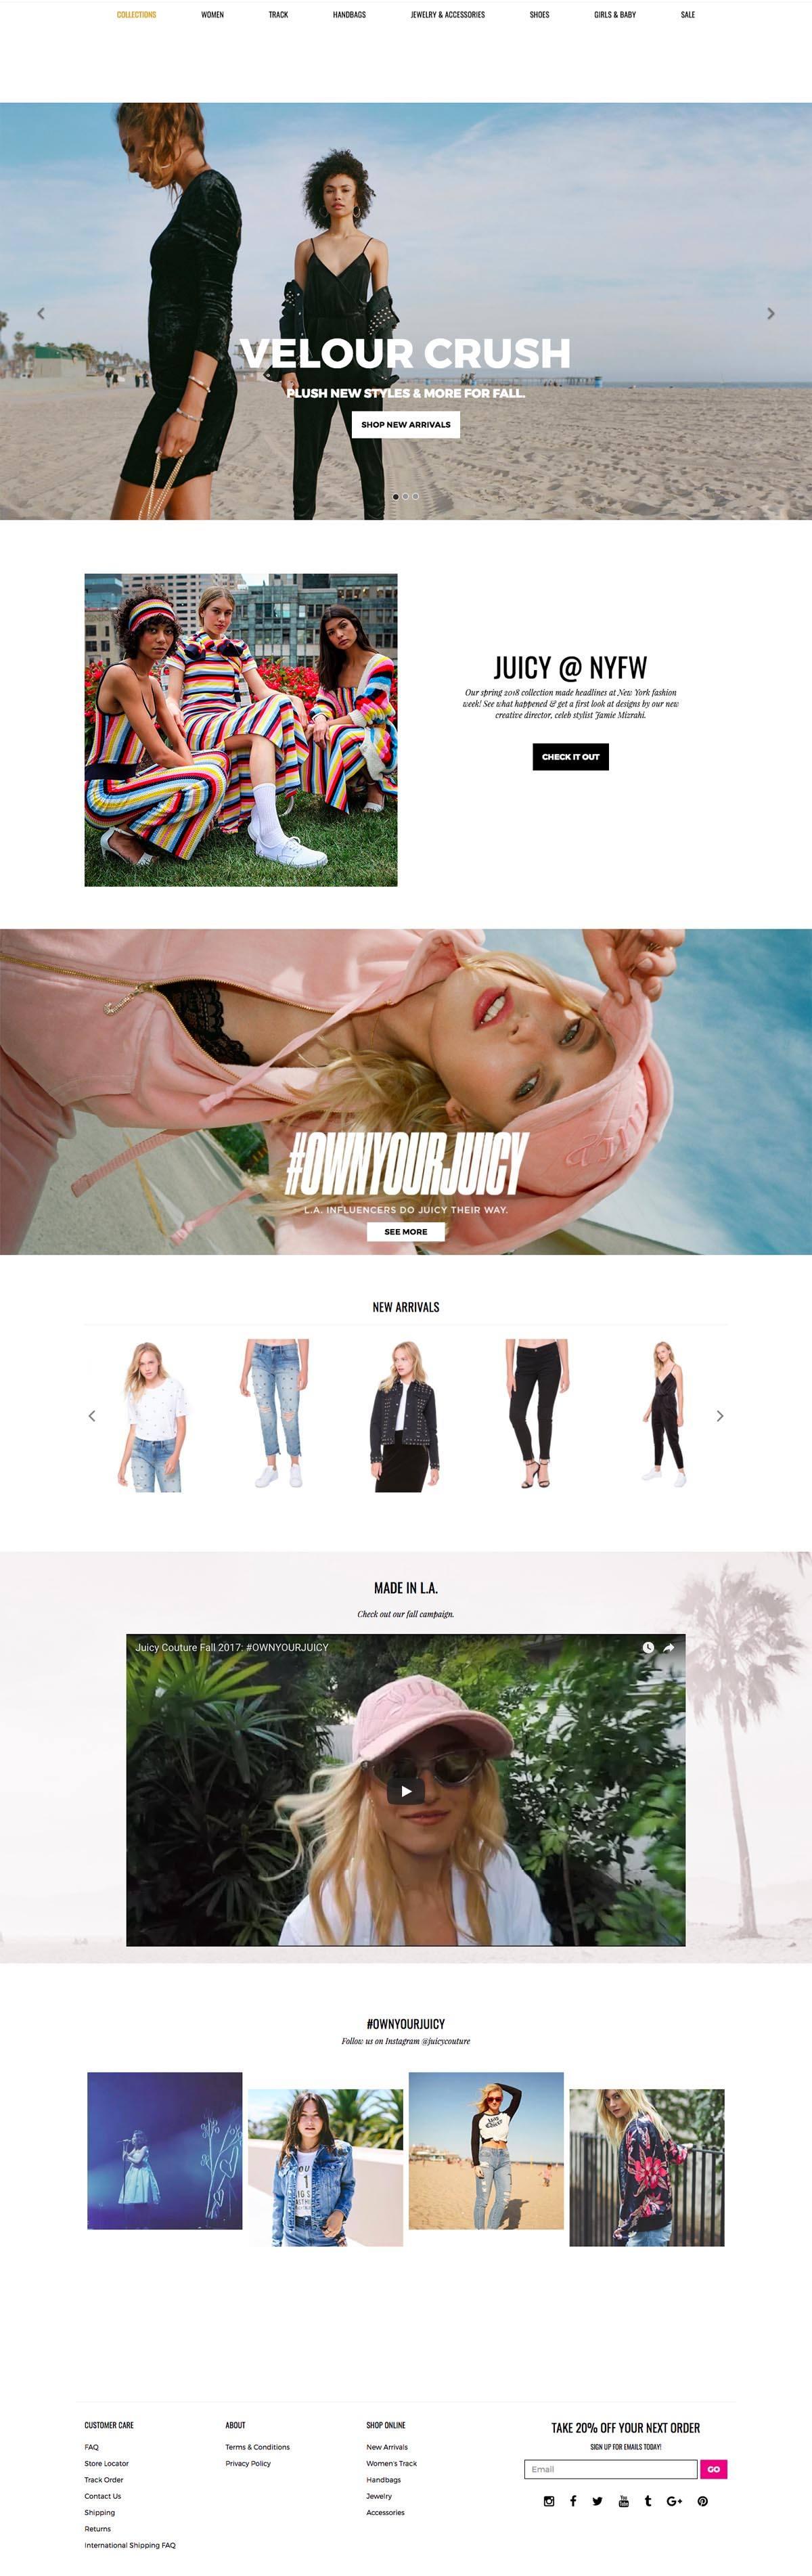 eCommerce website: Juicy Couture